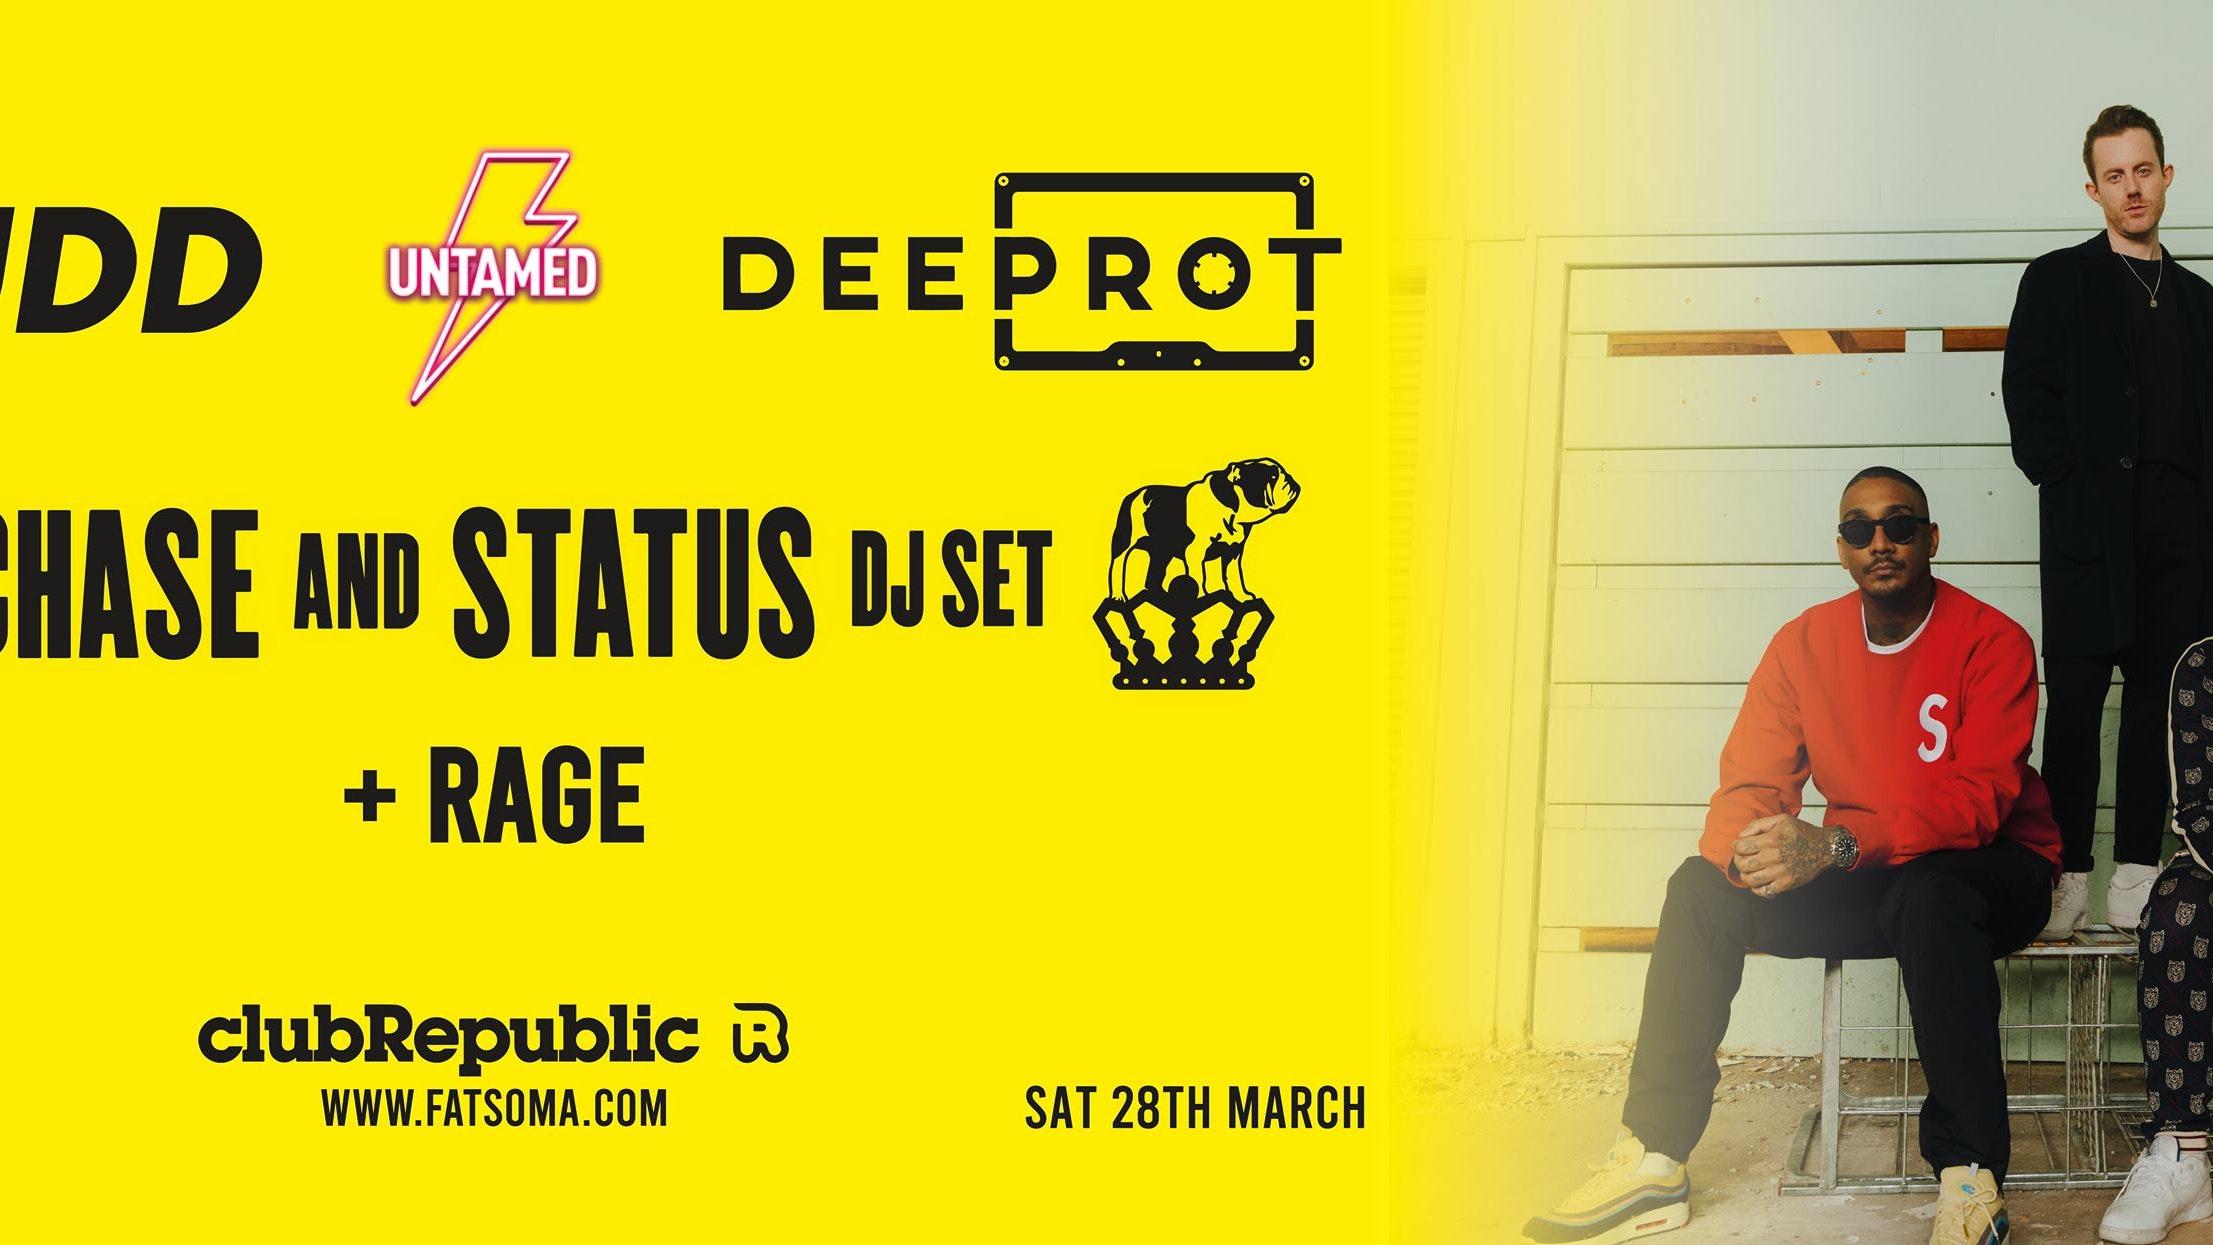 *** POSTPONED *** Untamed x Krudd x Deeprot Present: Chase & Status DJ Set & Rage